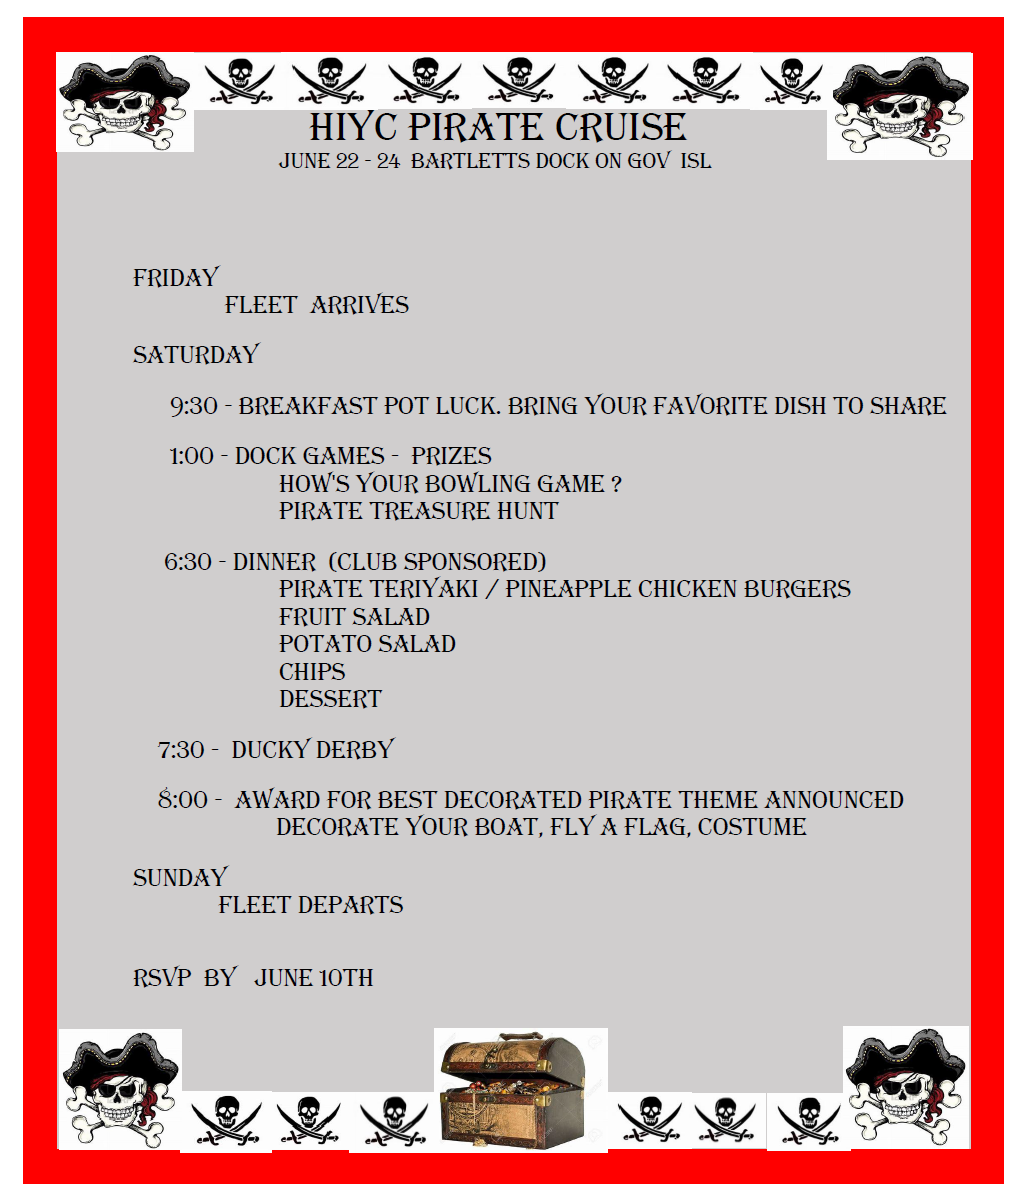 HIYC June 2018 cruise